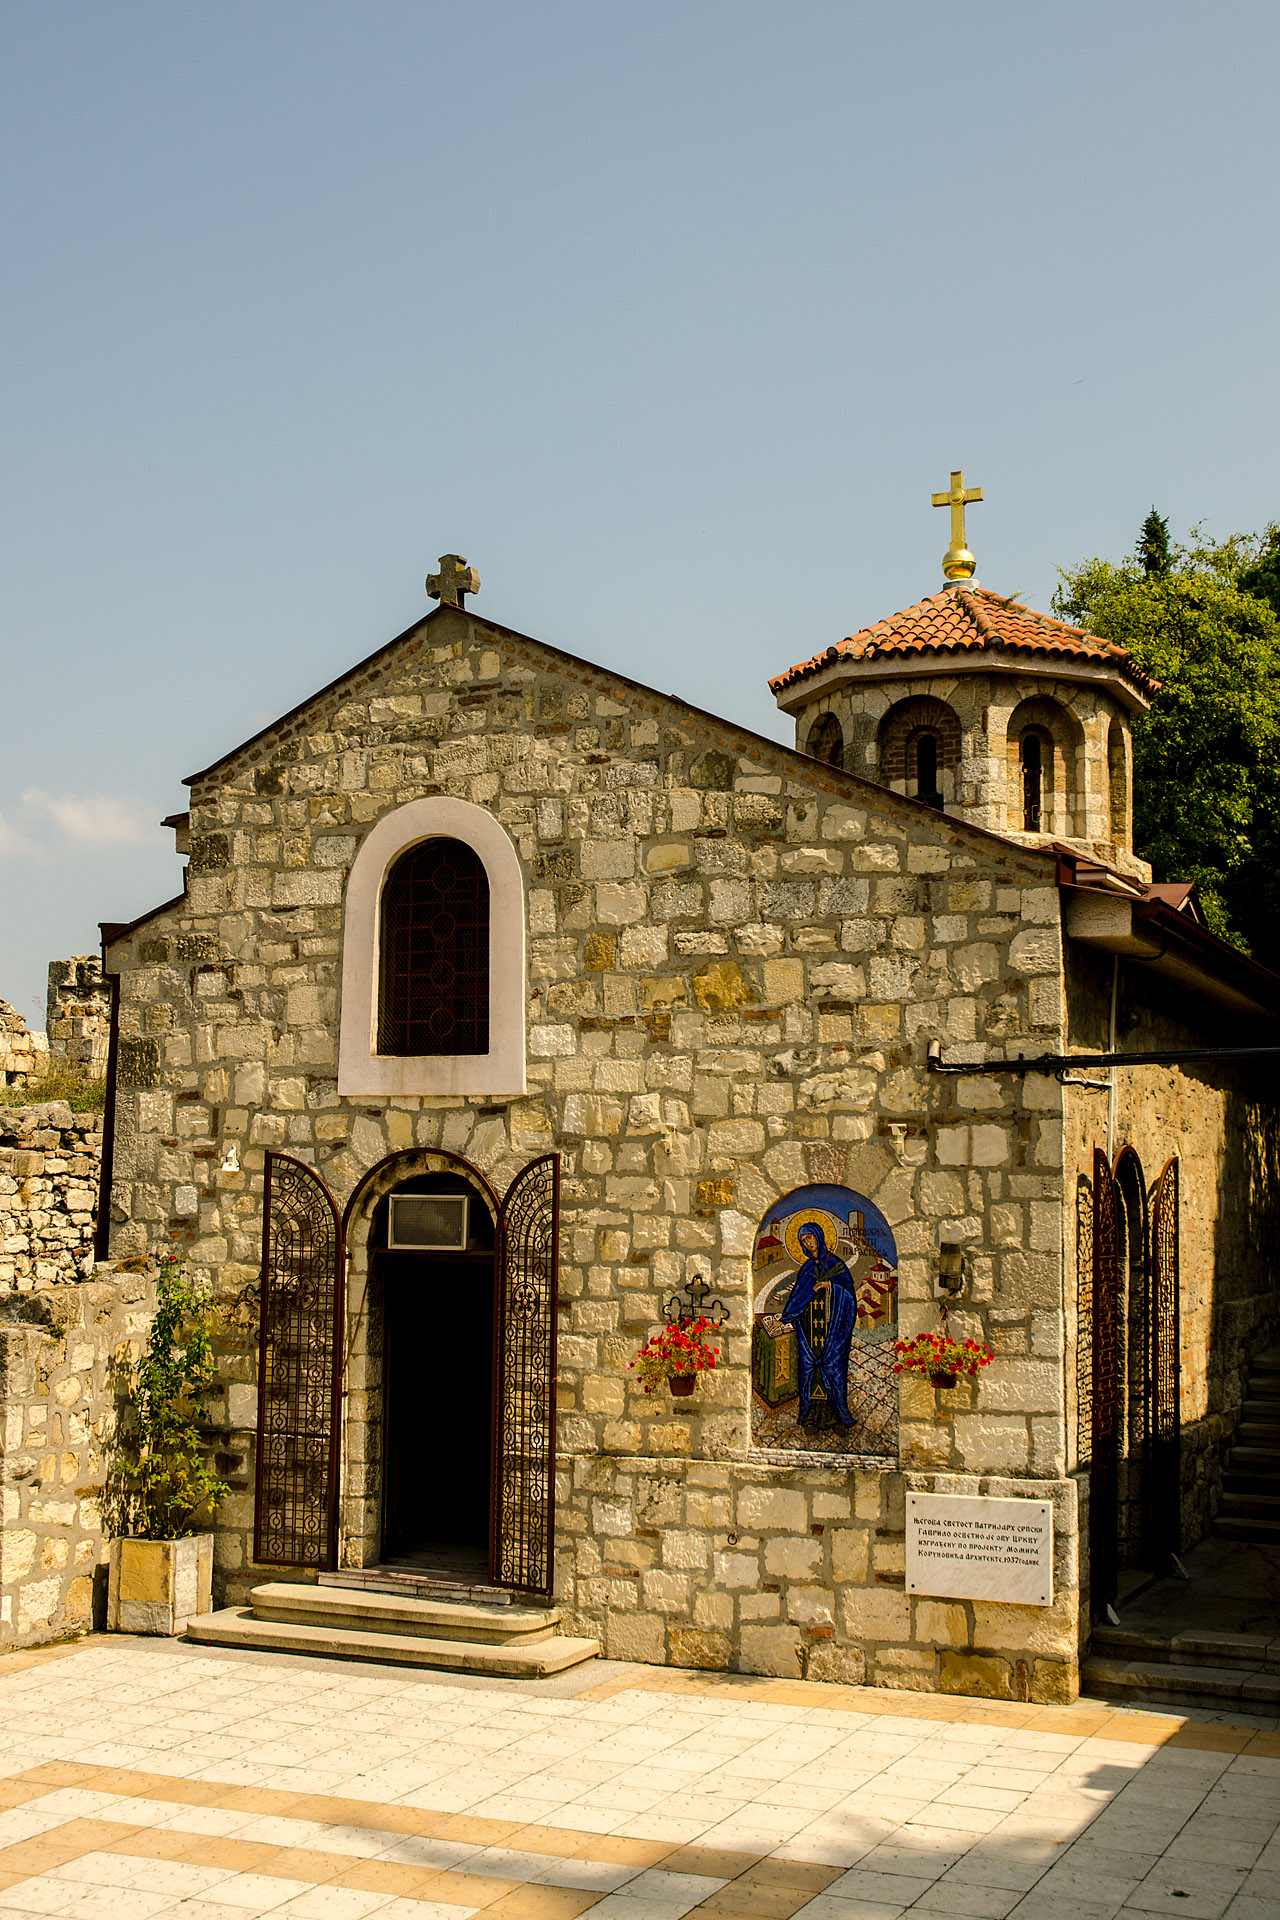 St. Petka's (Parascheva's) Chapel